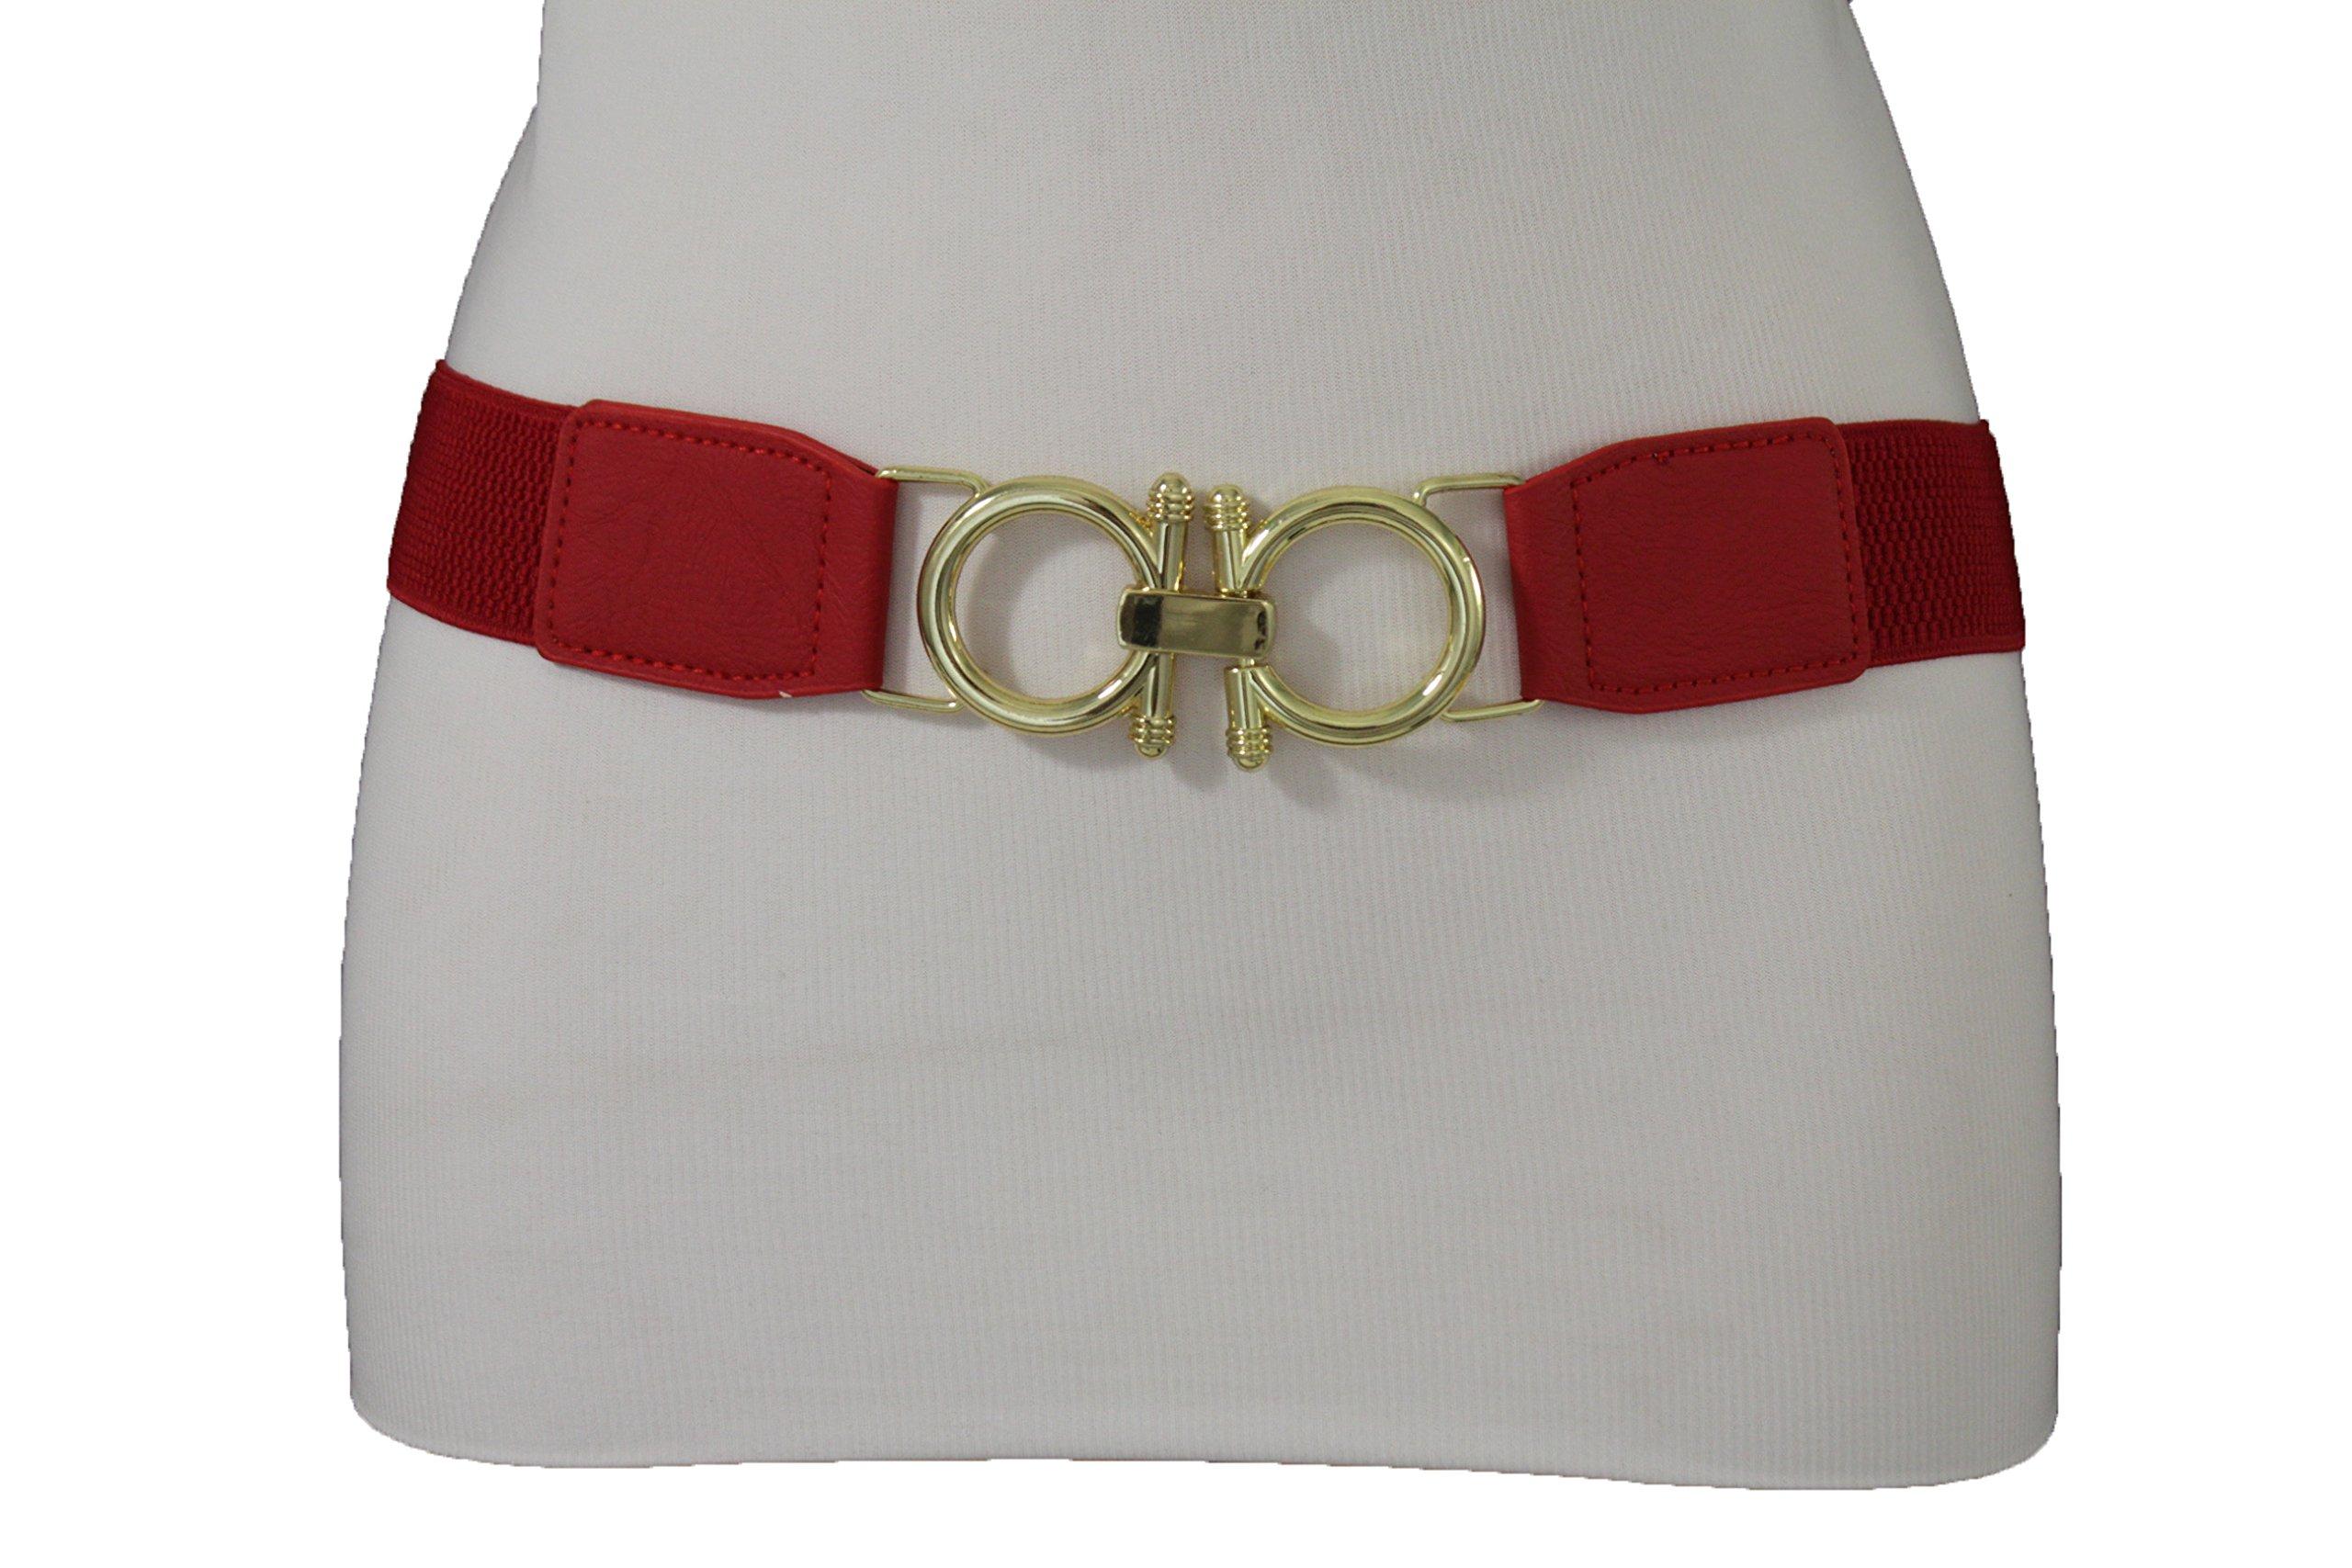 TFJ Women Elastic Fashion Belt Hip High Waist Gold Buckle Elastic Plus M L XL Red